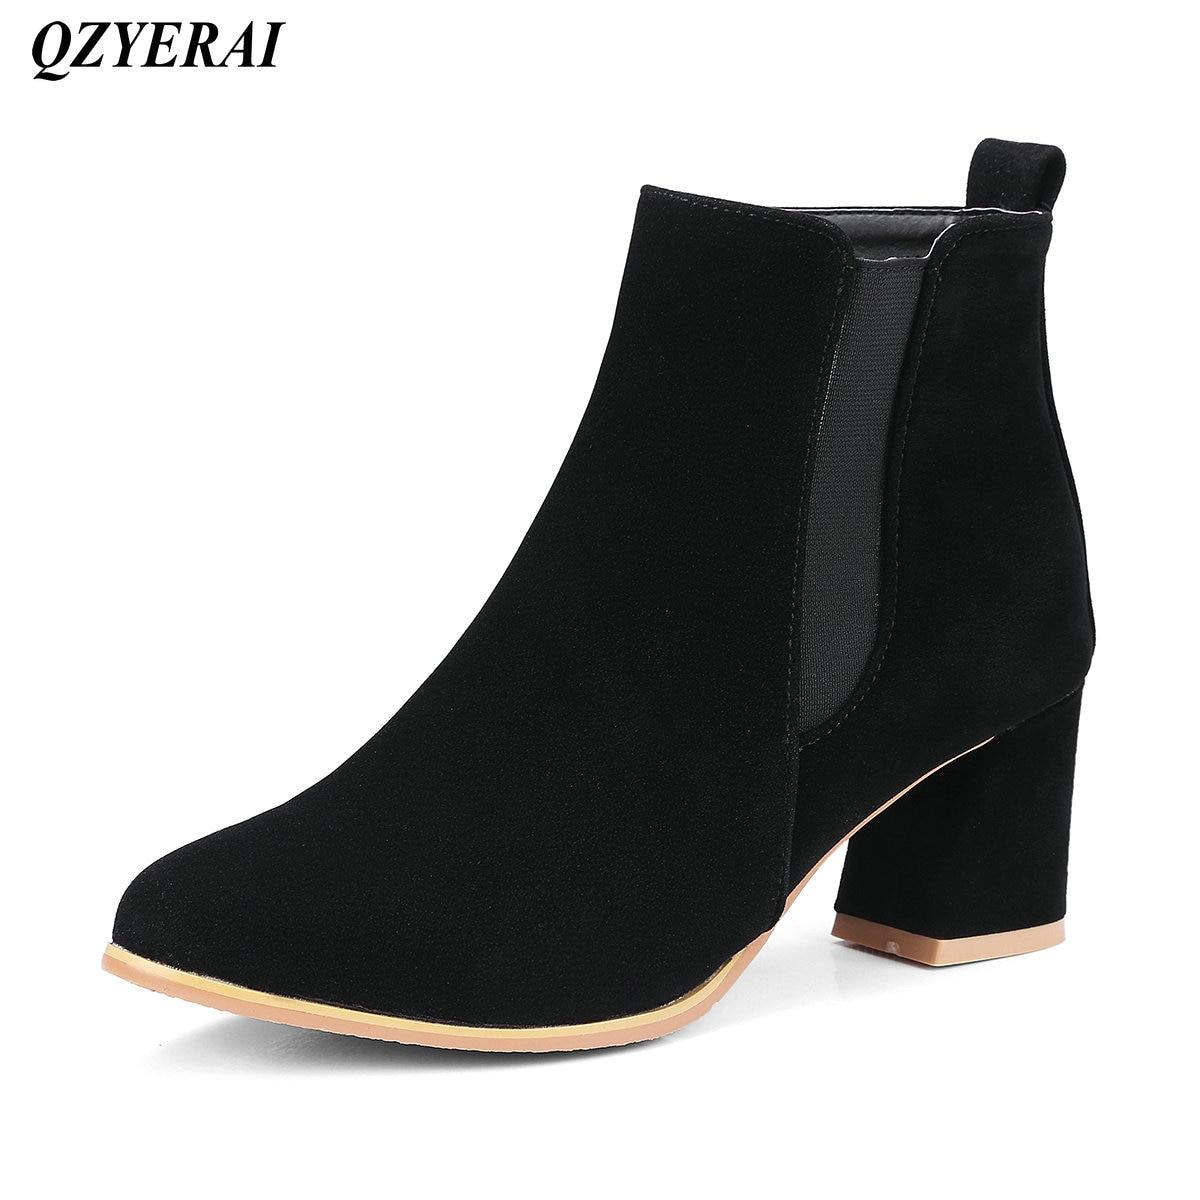 QZYERAI Autumn winter madam coarse heel Martin boots font b womens b font boots fashionable font